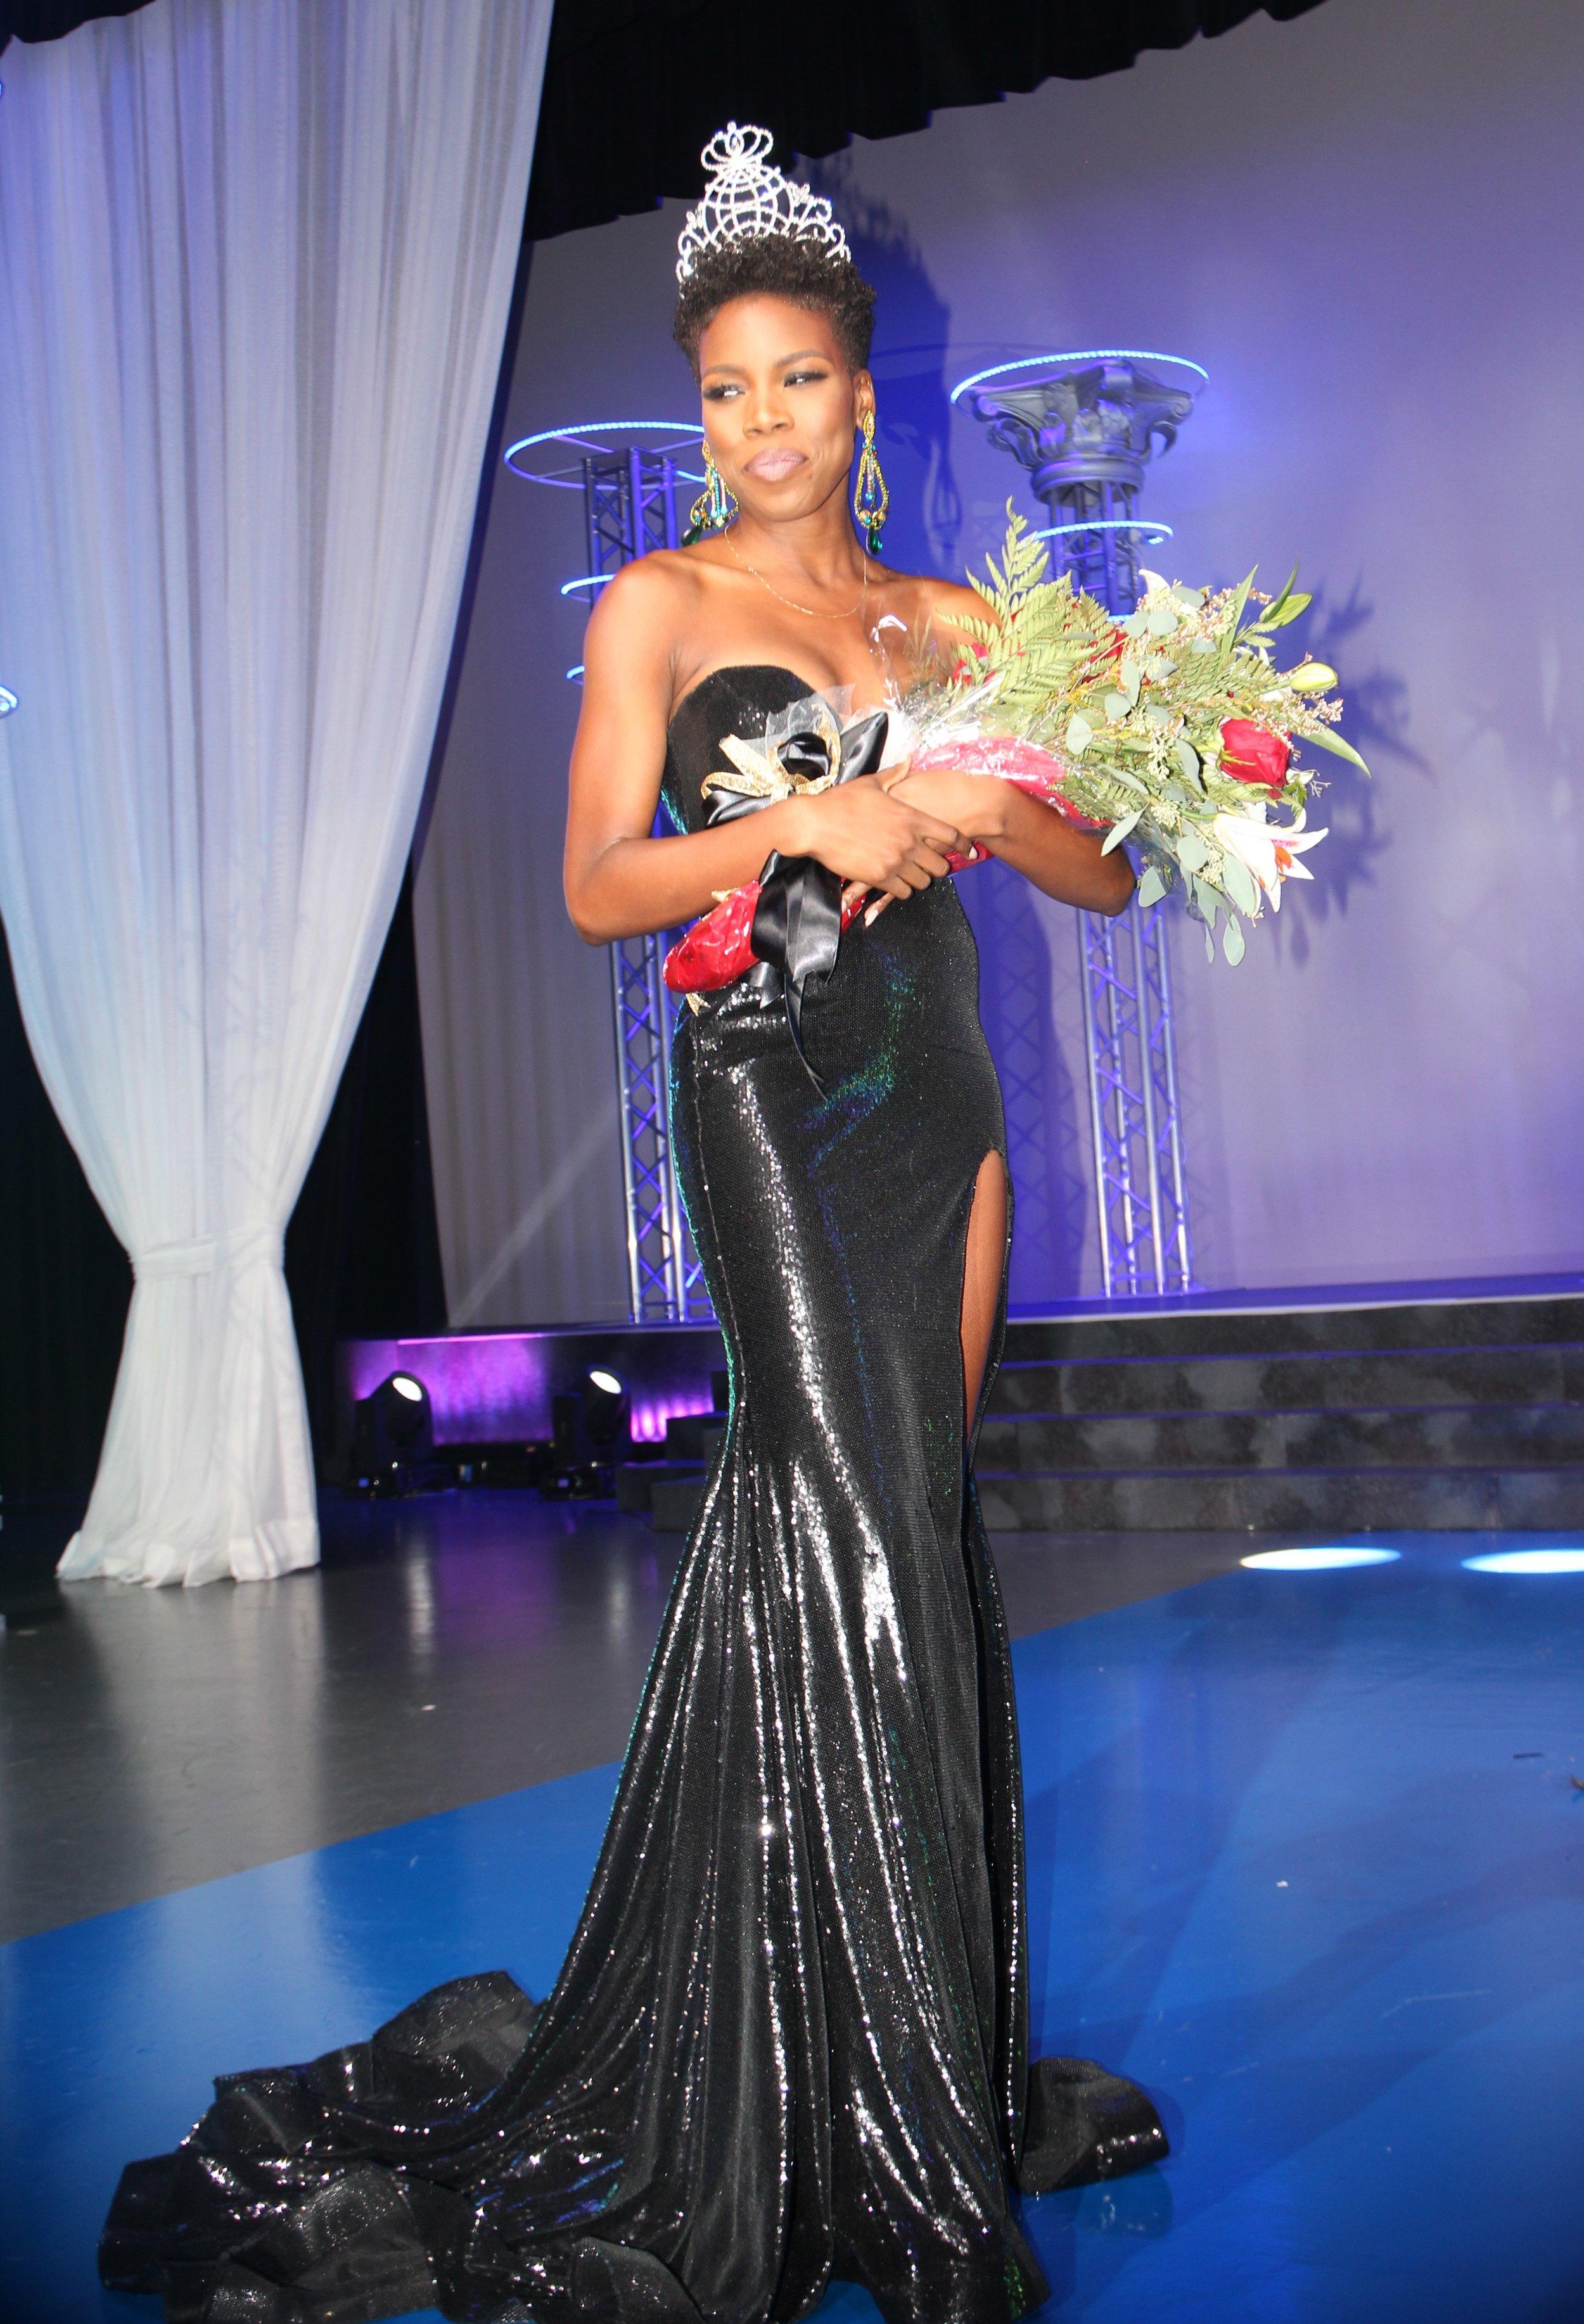 Miss Black America 2018 Winner-Ryan Richardson wearing ASE Beauty Lipstick